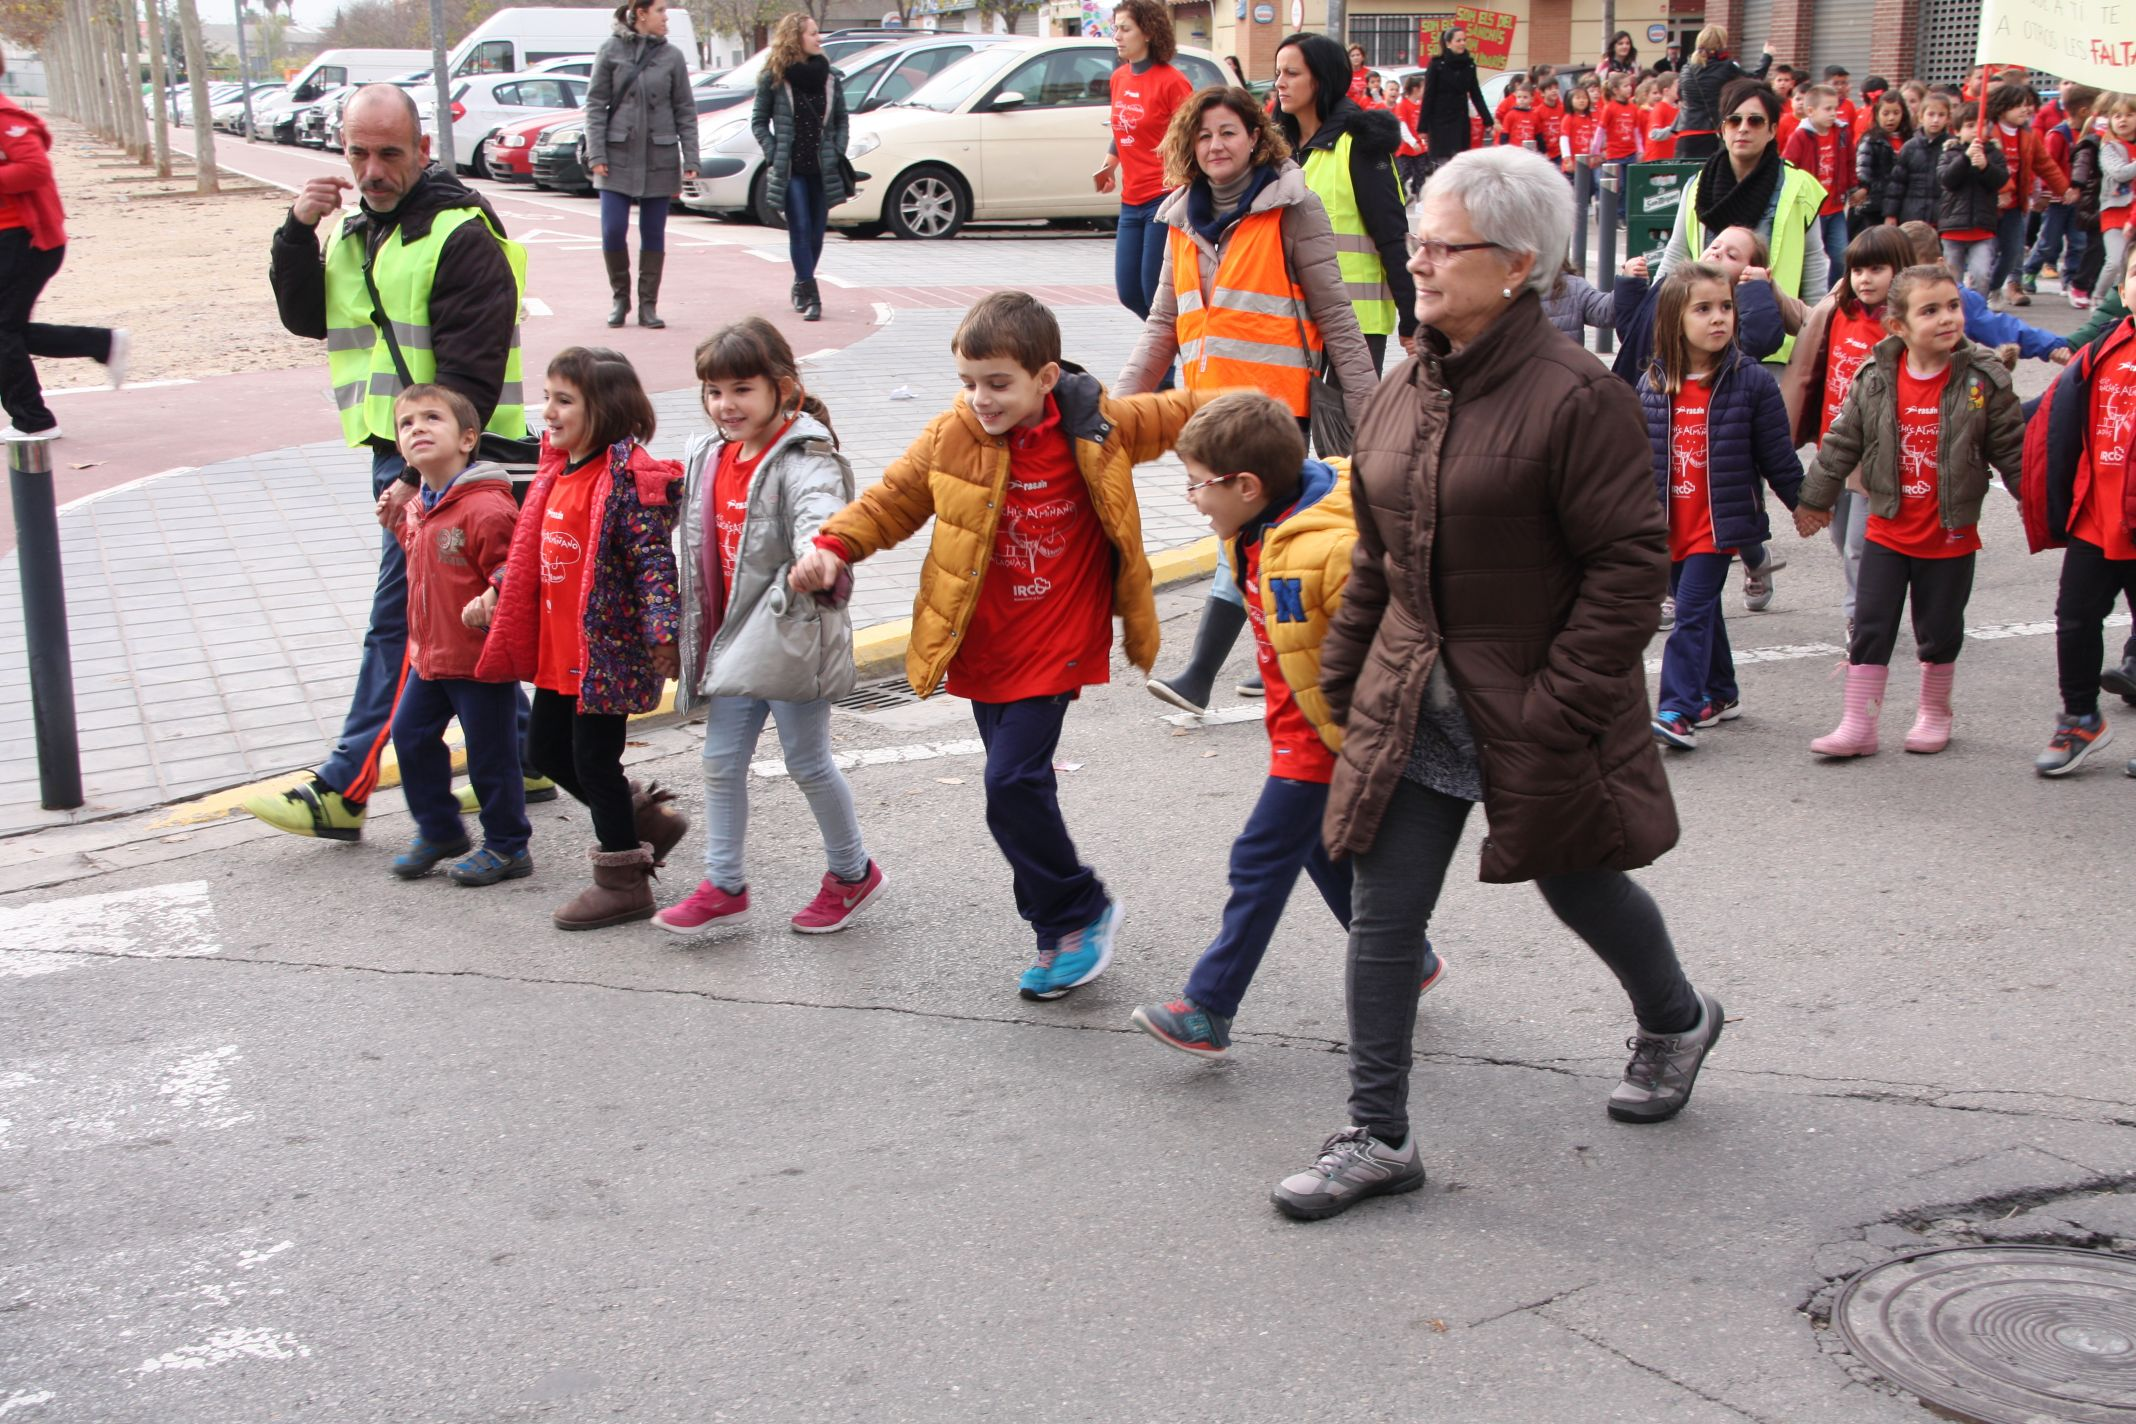 II Marxa Solidaria 2016 (5)